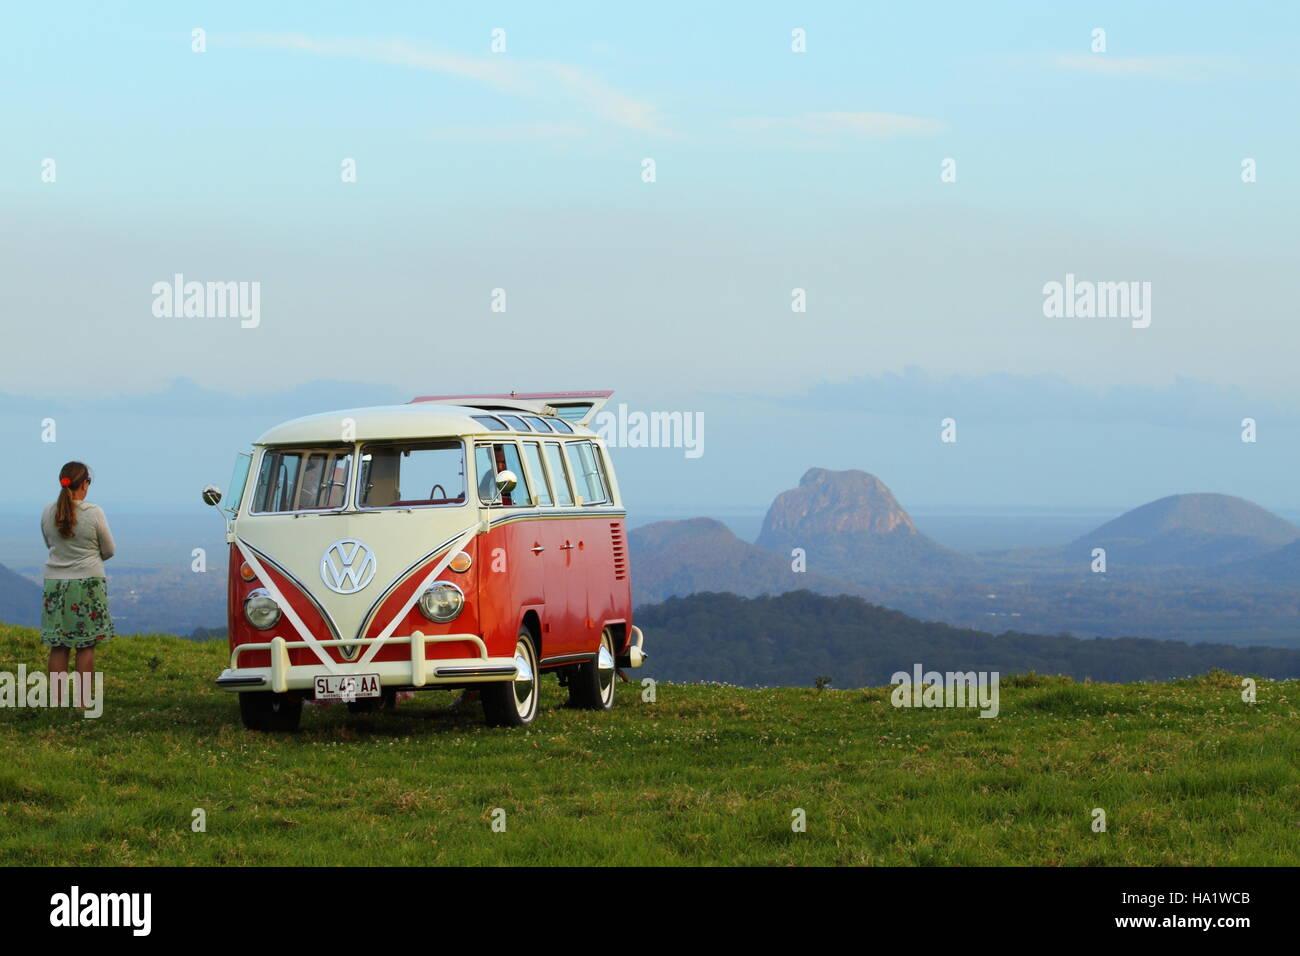 vw bus camping stockfotos vw bus camping bilder alamy. Black Bedroom Furniture Sets. Home Design Ideas